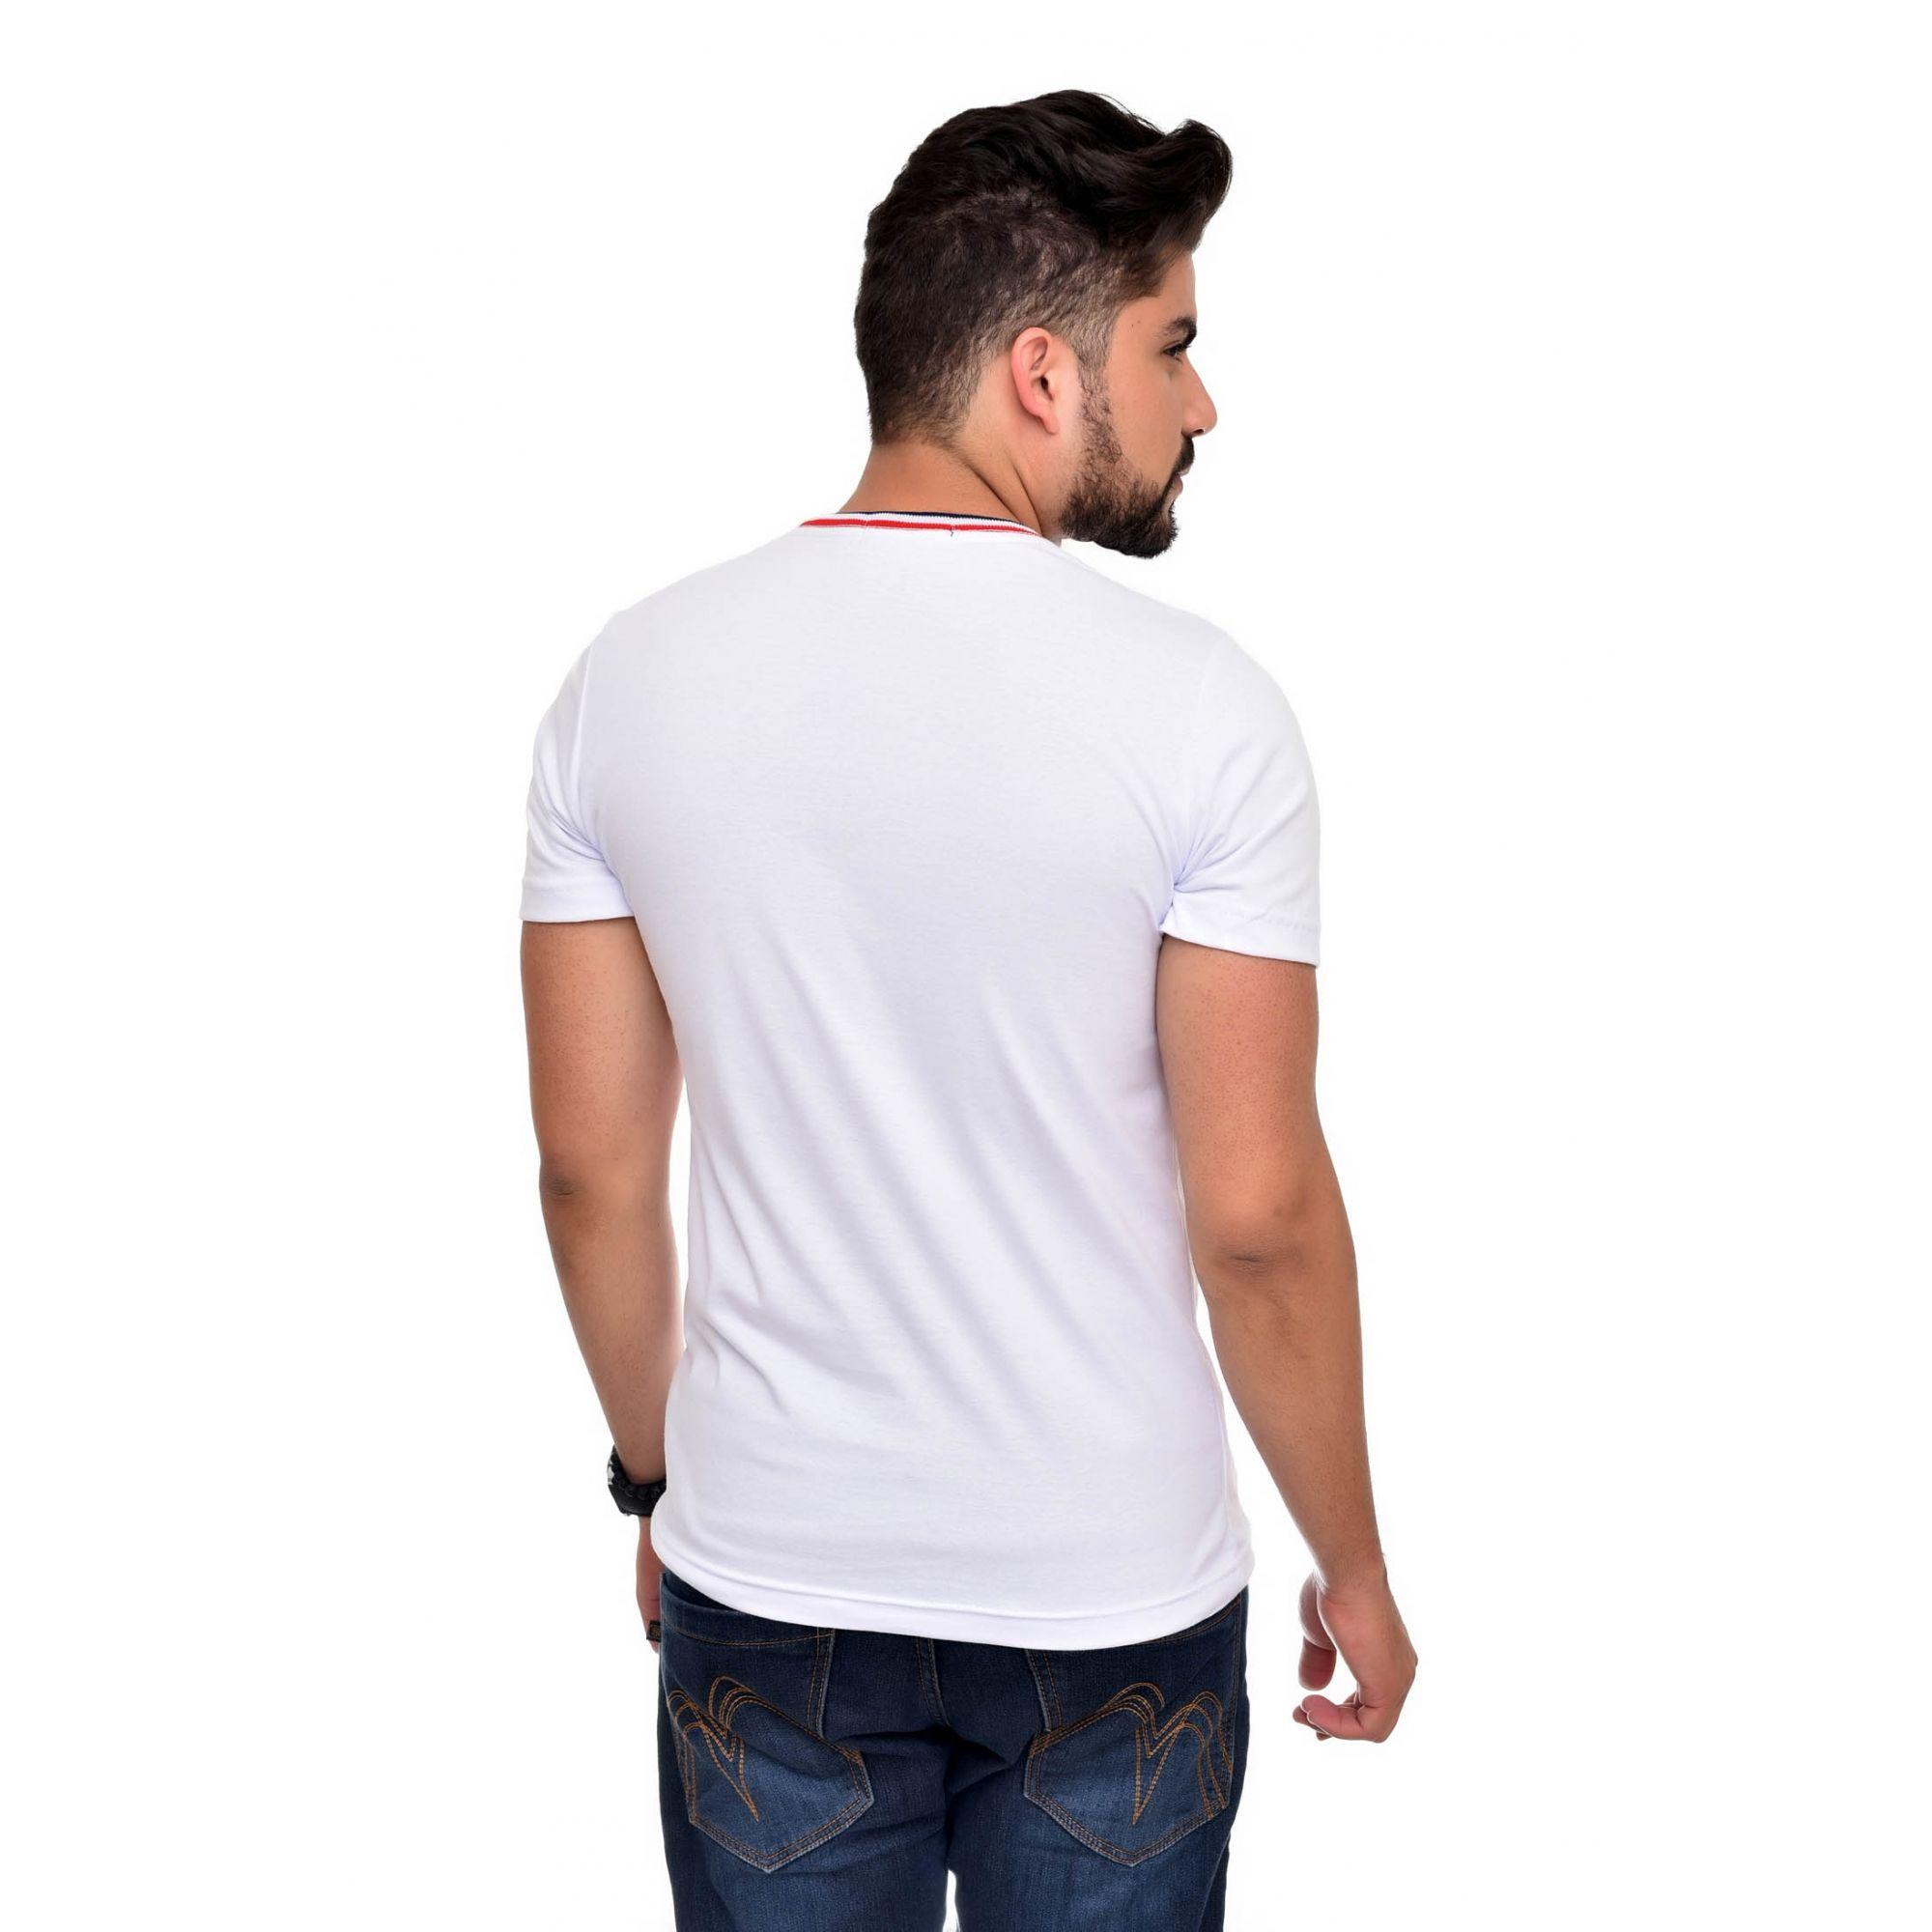 Camiseta RL Branca TR  - Ca Brasileira